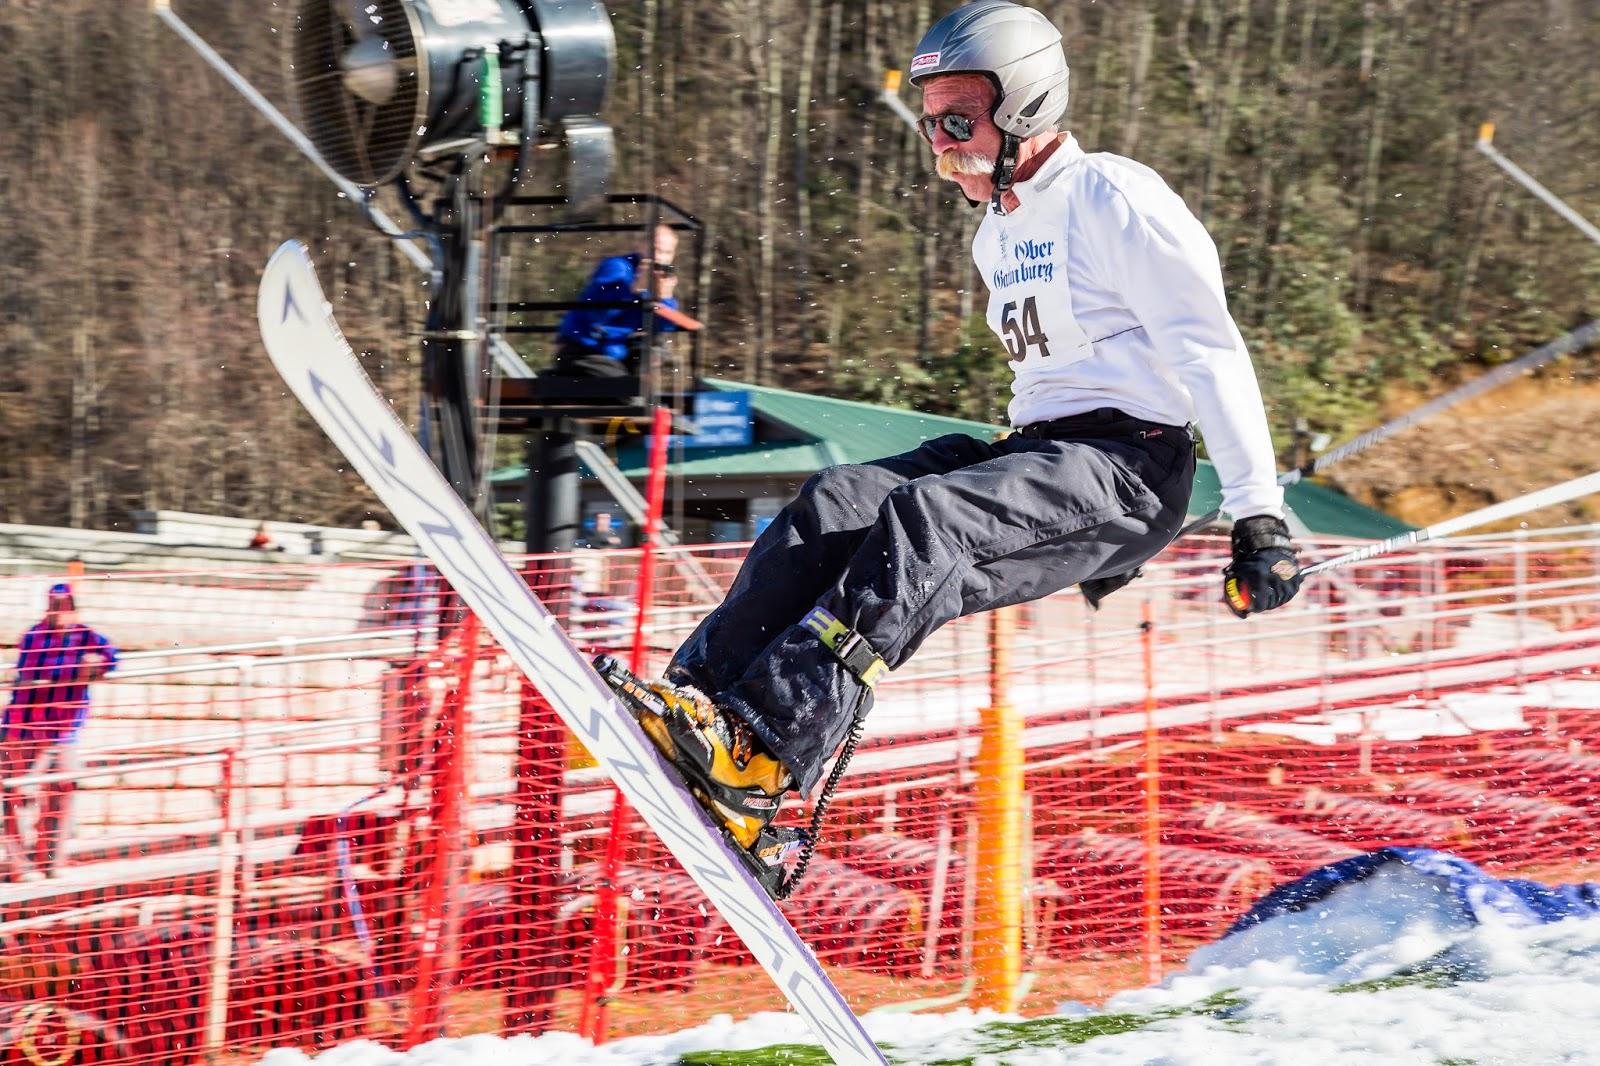 Ober Gatlinburg, Spring Fling, snowboarding, skiing, Tennessee